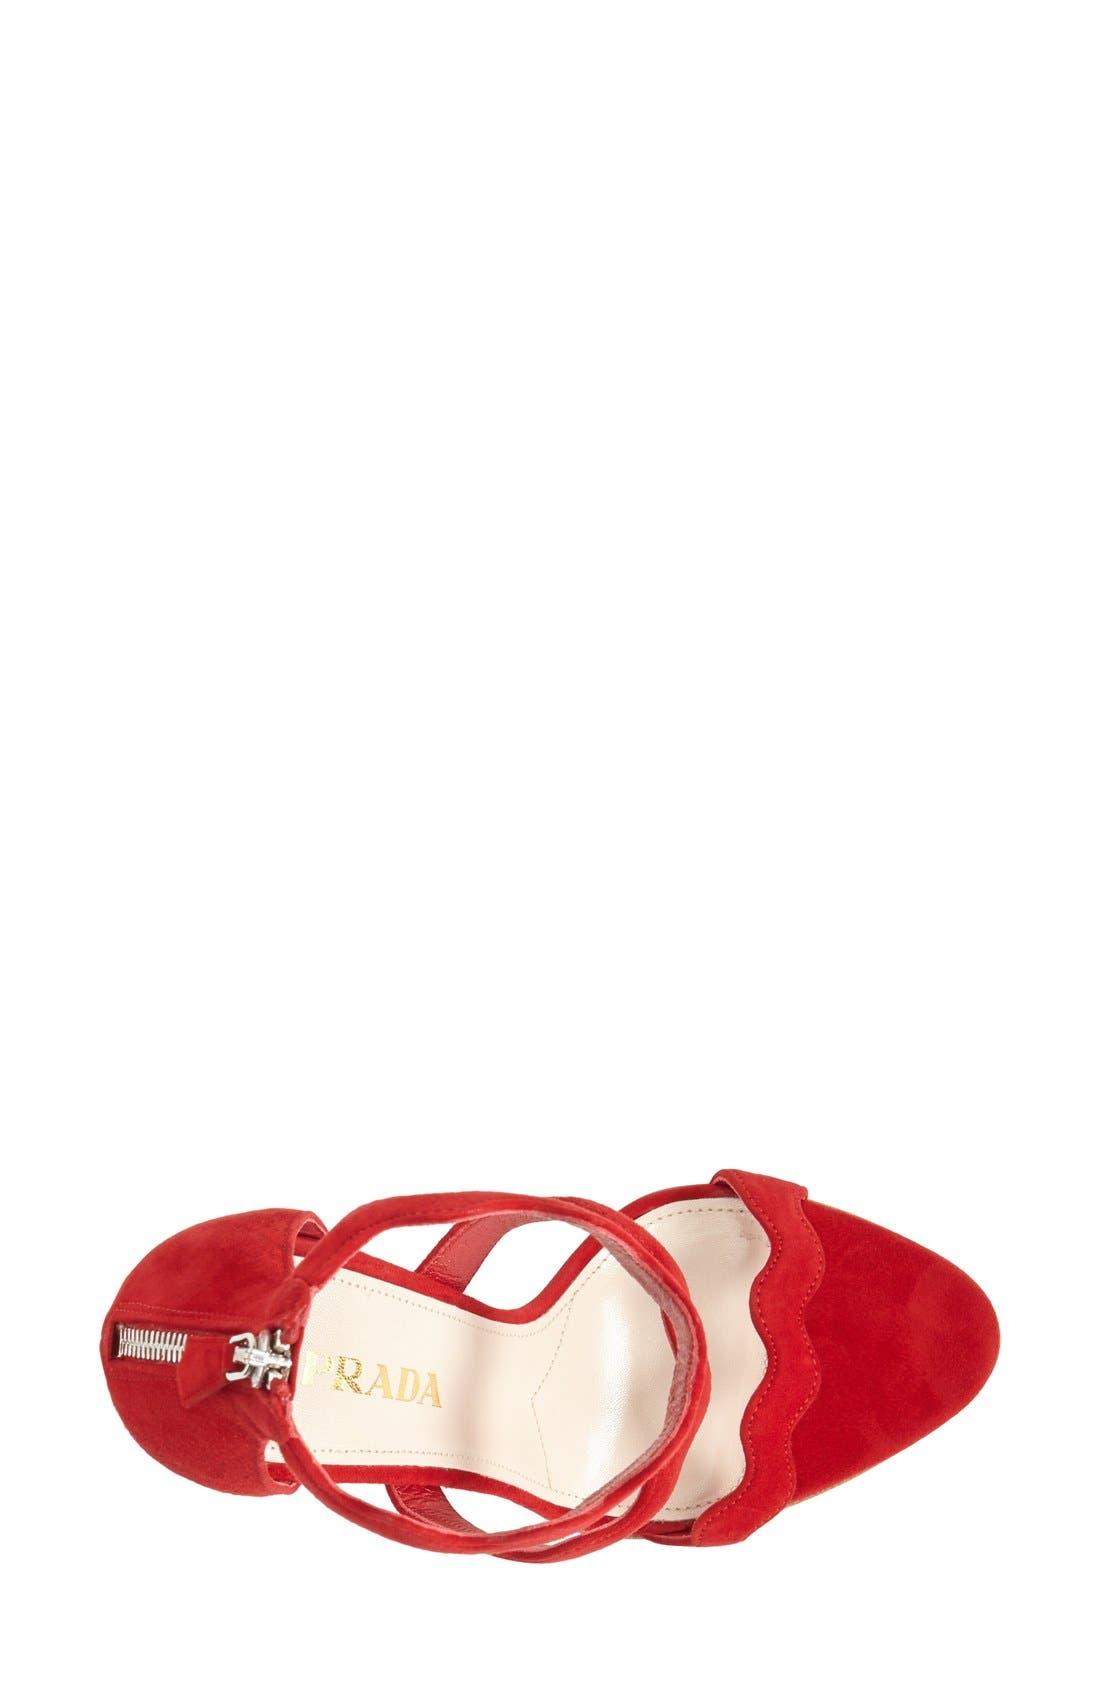 Alternate Image 3  - Prada Suede Ankle Strap Sandal (Women)